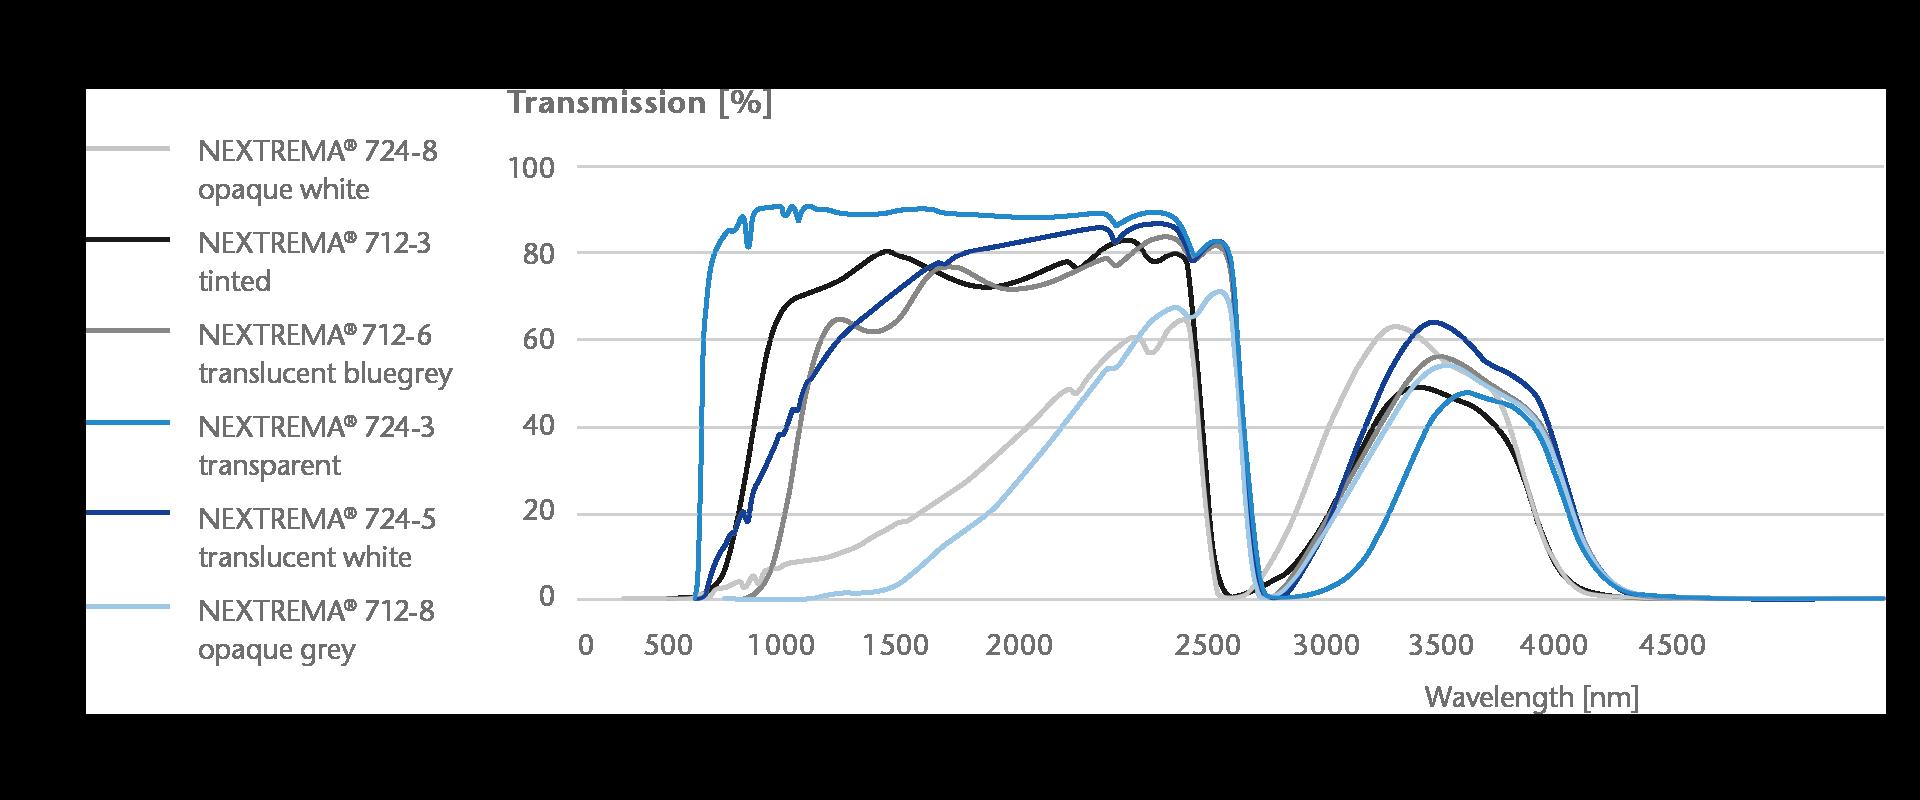 NEXTREMA transmission curve